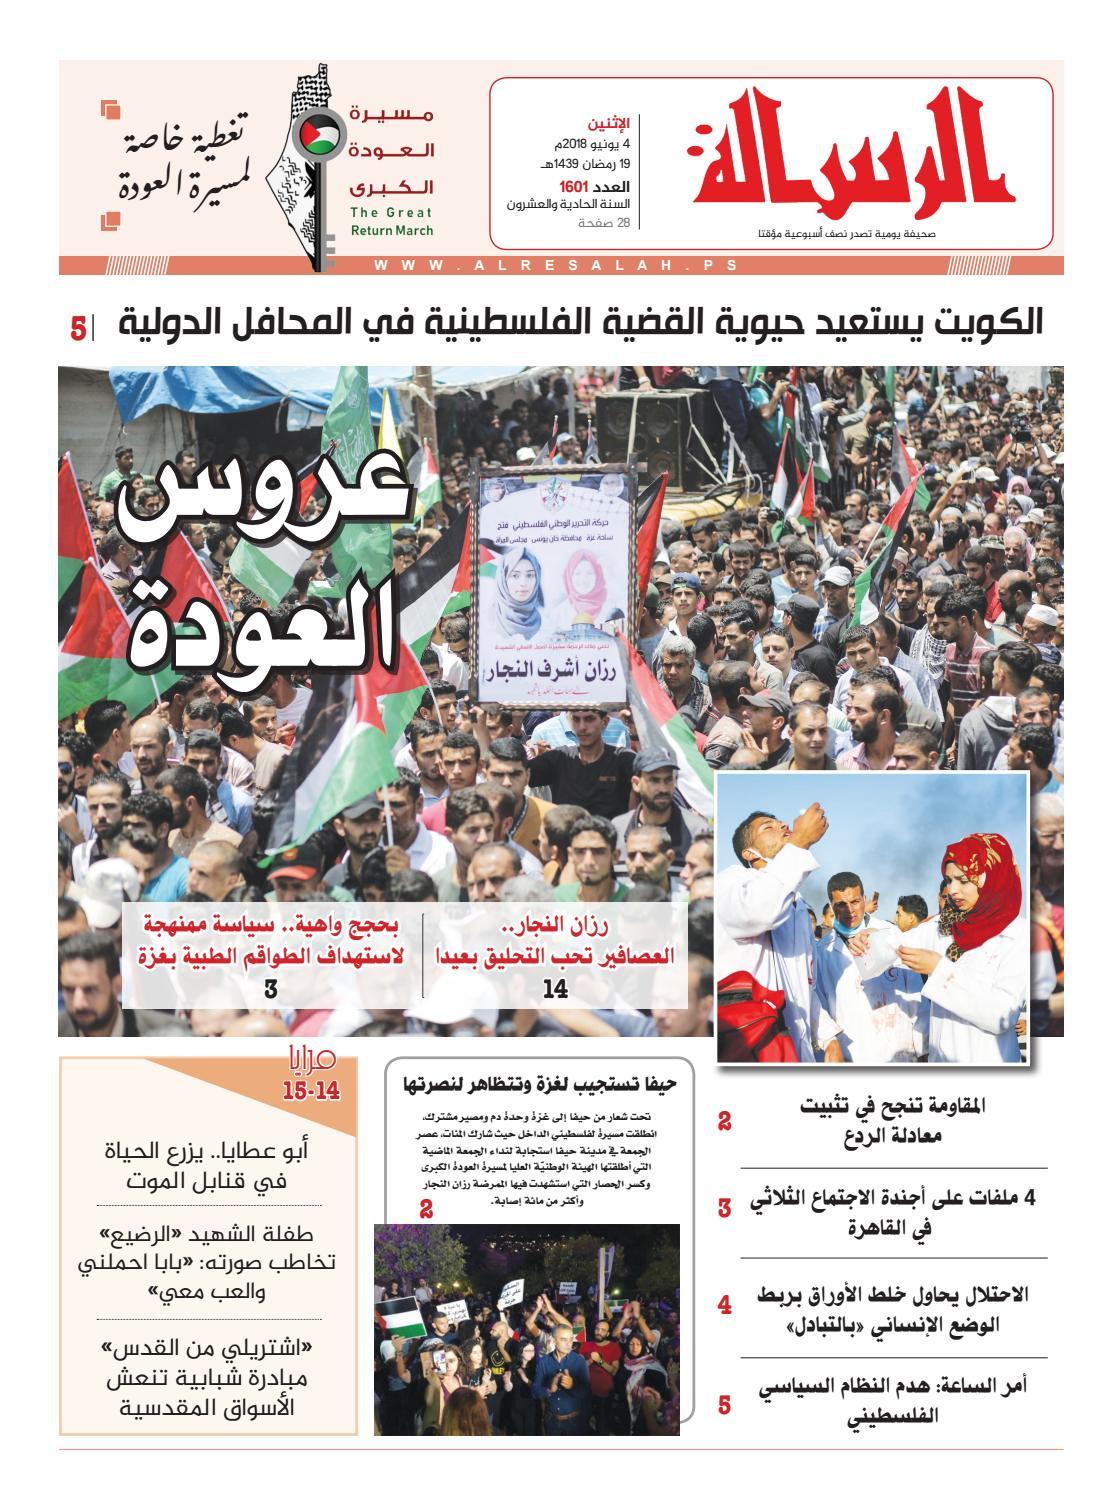 4e3f97f88 صحيفة الرسالة والعدد ١٦٠١ ليوم الاثنين by صحيفة الرسالة - issuu